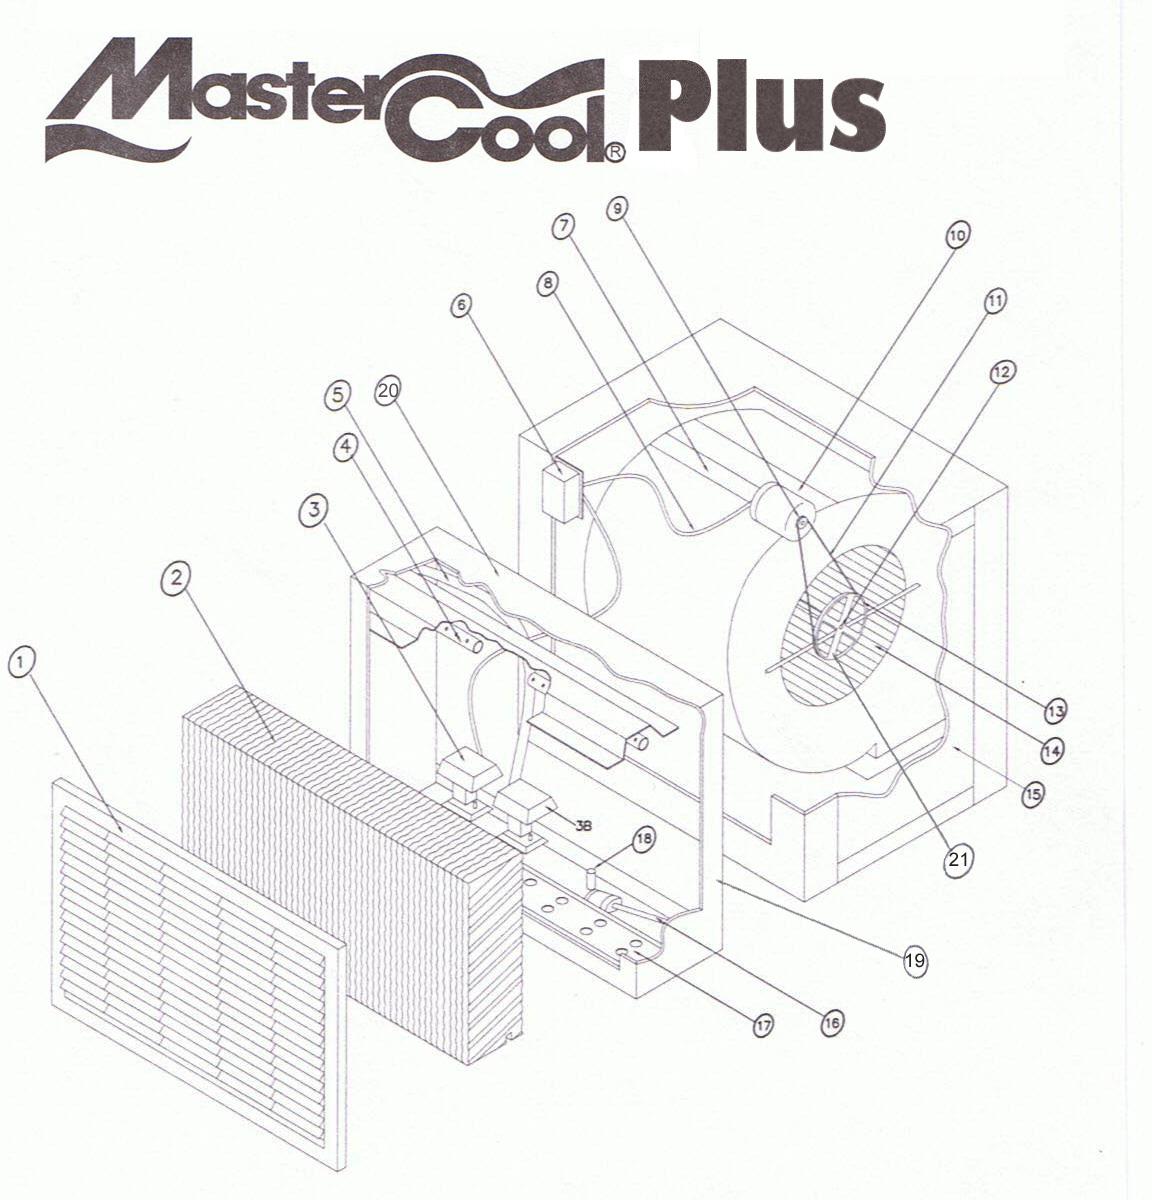 hight resolution of mastercool wiring diagram wiring diagram show mastercool motor wiring diagram wiring diagram name mastercool thermostat wiring